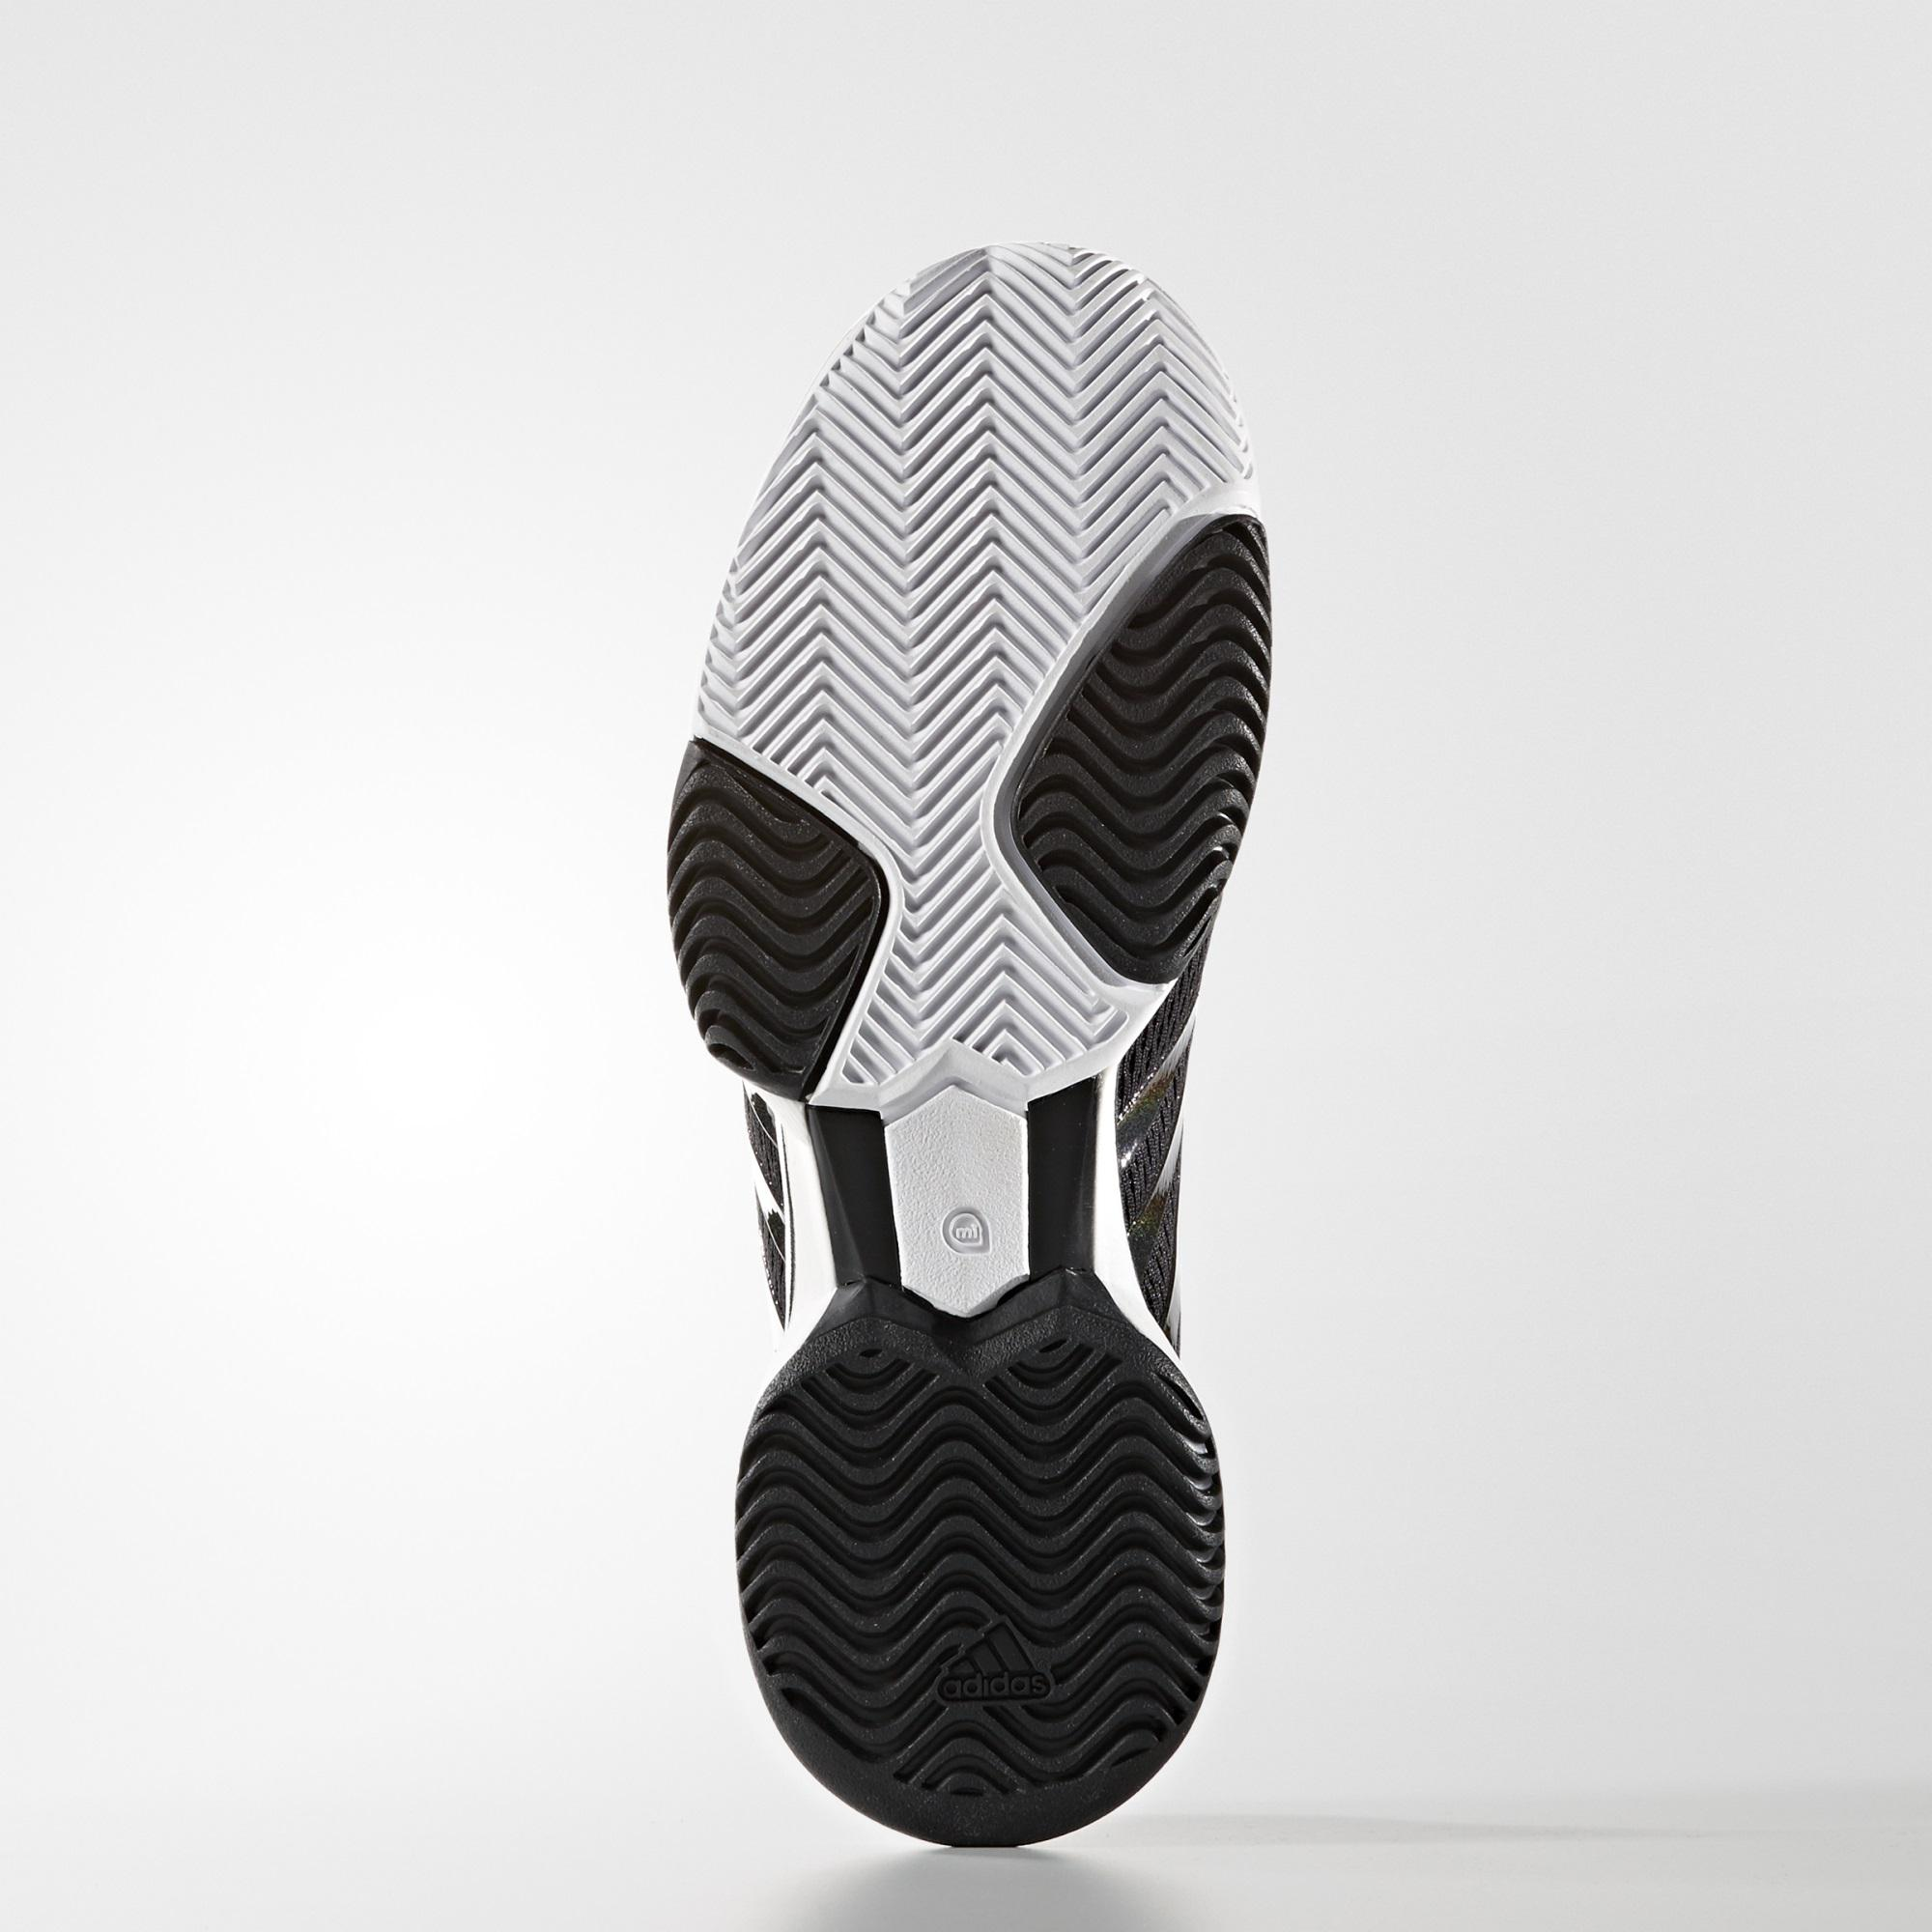 best service 40148 7dc50 Adidas Womens SMC Barricade 2016 Tennis Shoes - Black